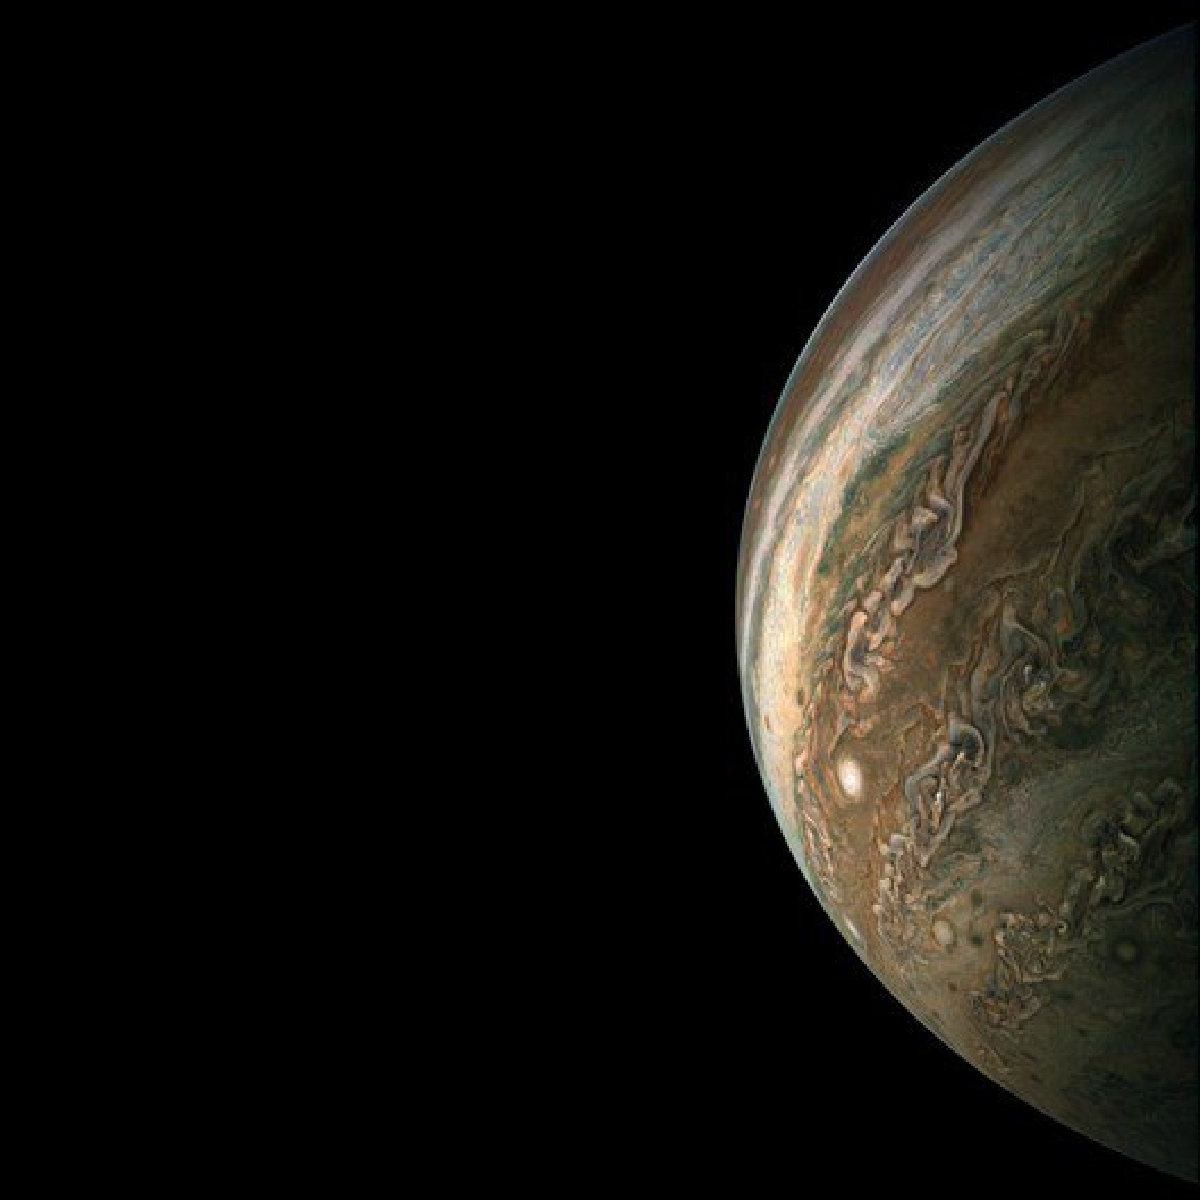 (Business Insider/NASA/JPL-Caltech/SwRI/MSSS/Gerald Eichstädt/Gerald Eichstädt )